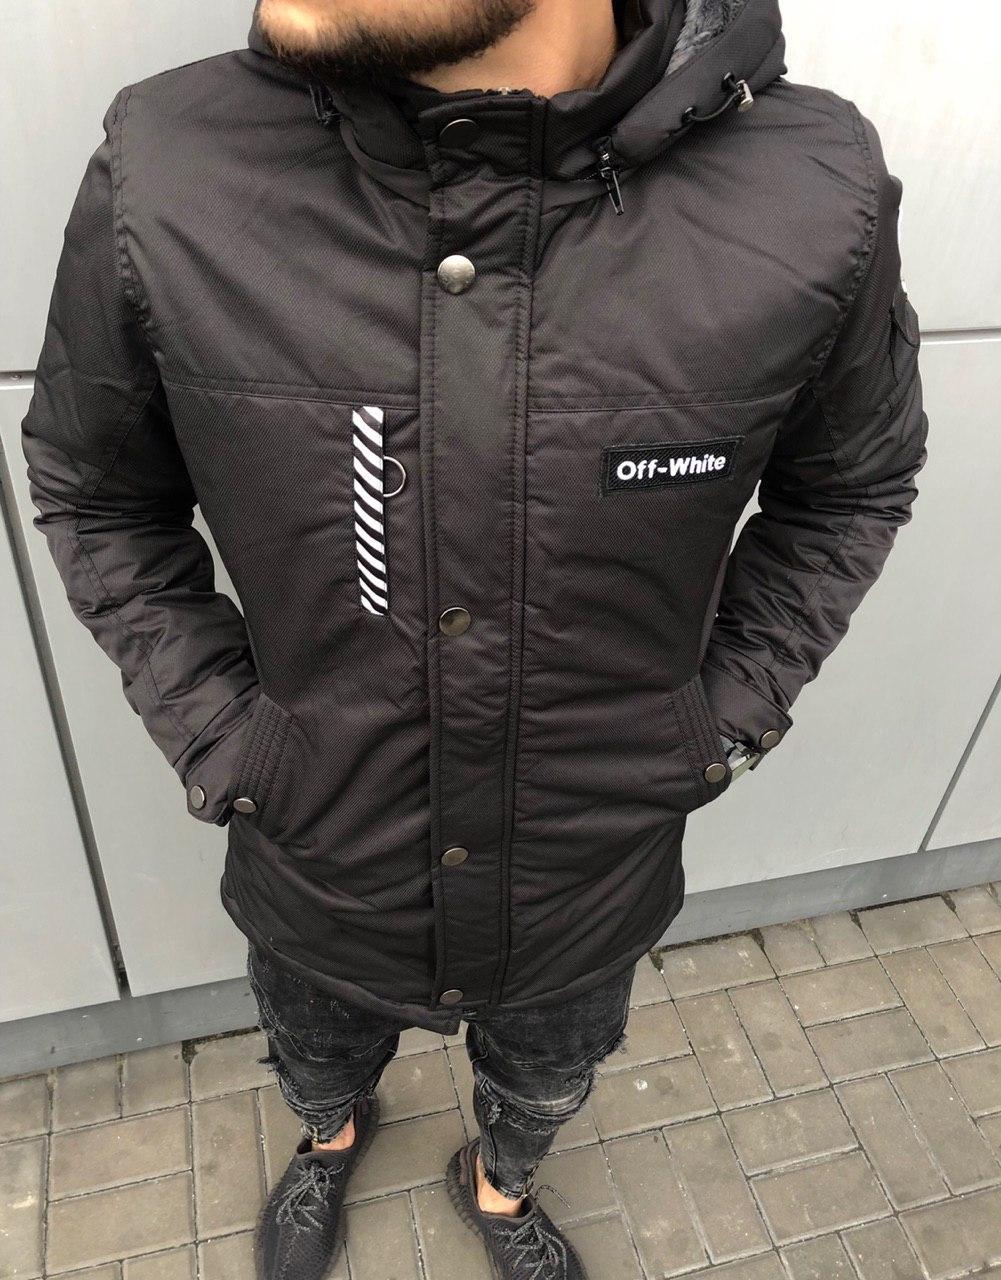 😜 Куртка - Мужскаяя осенняя куртка черного цвета Off-White